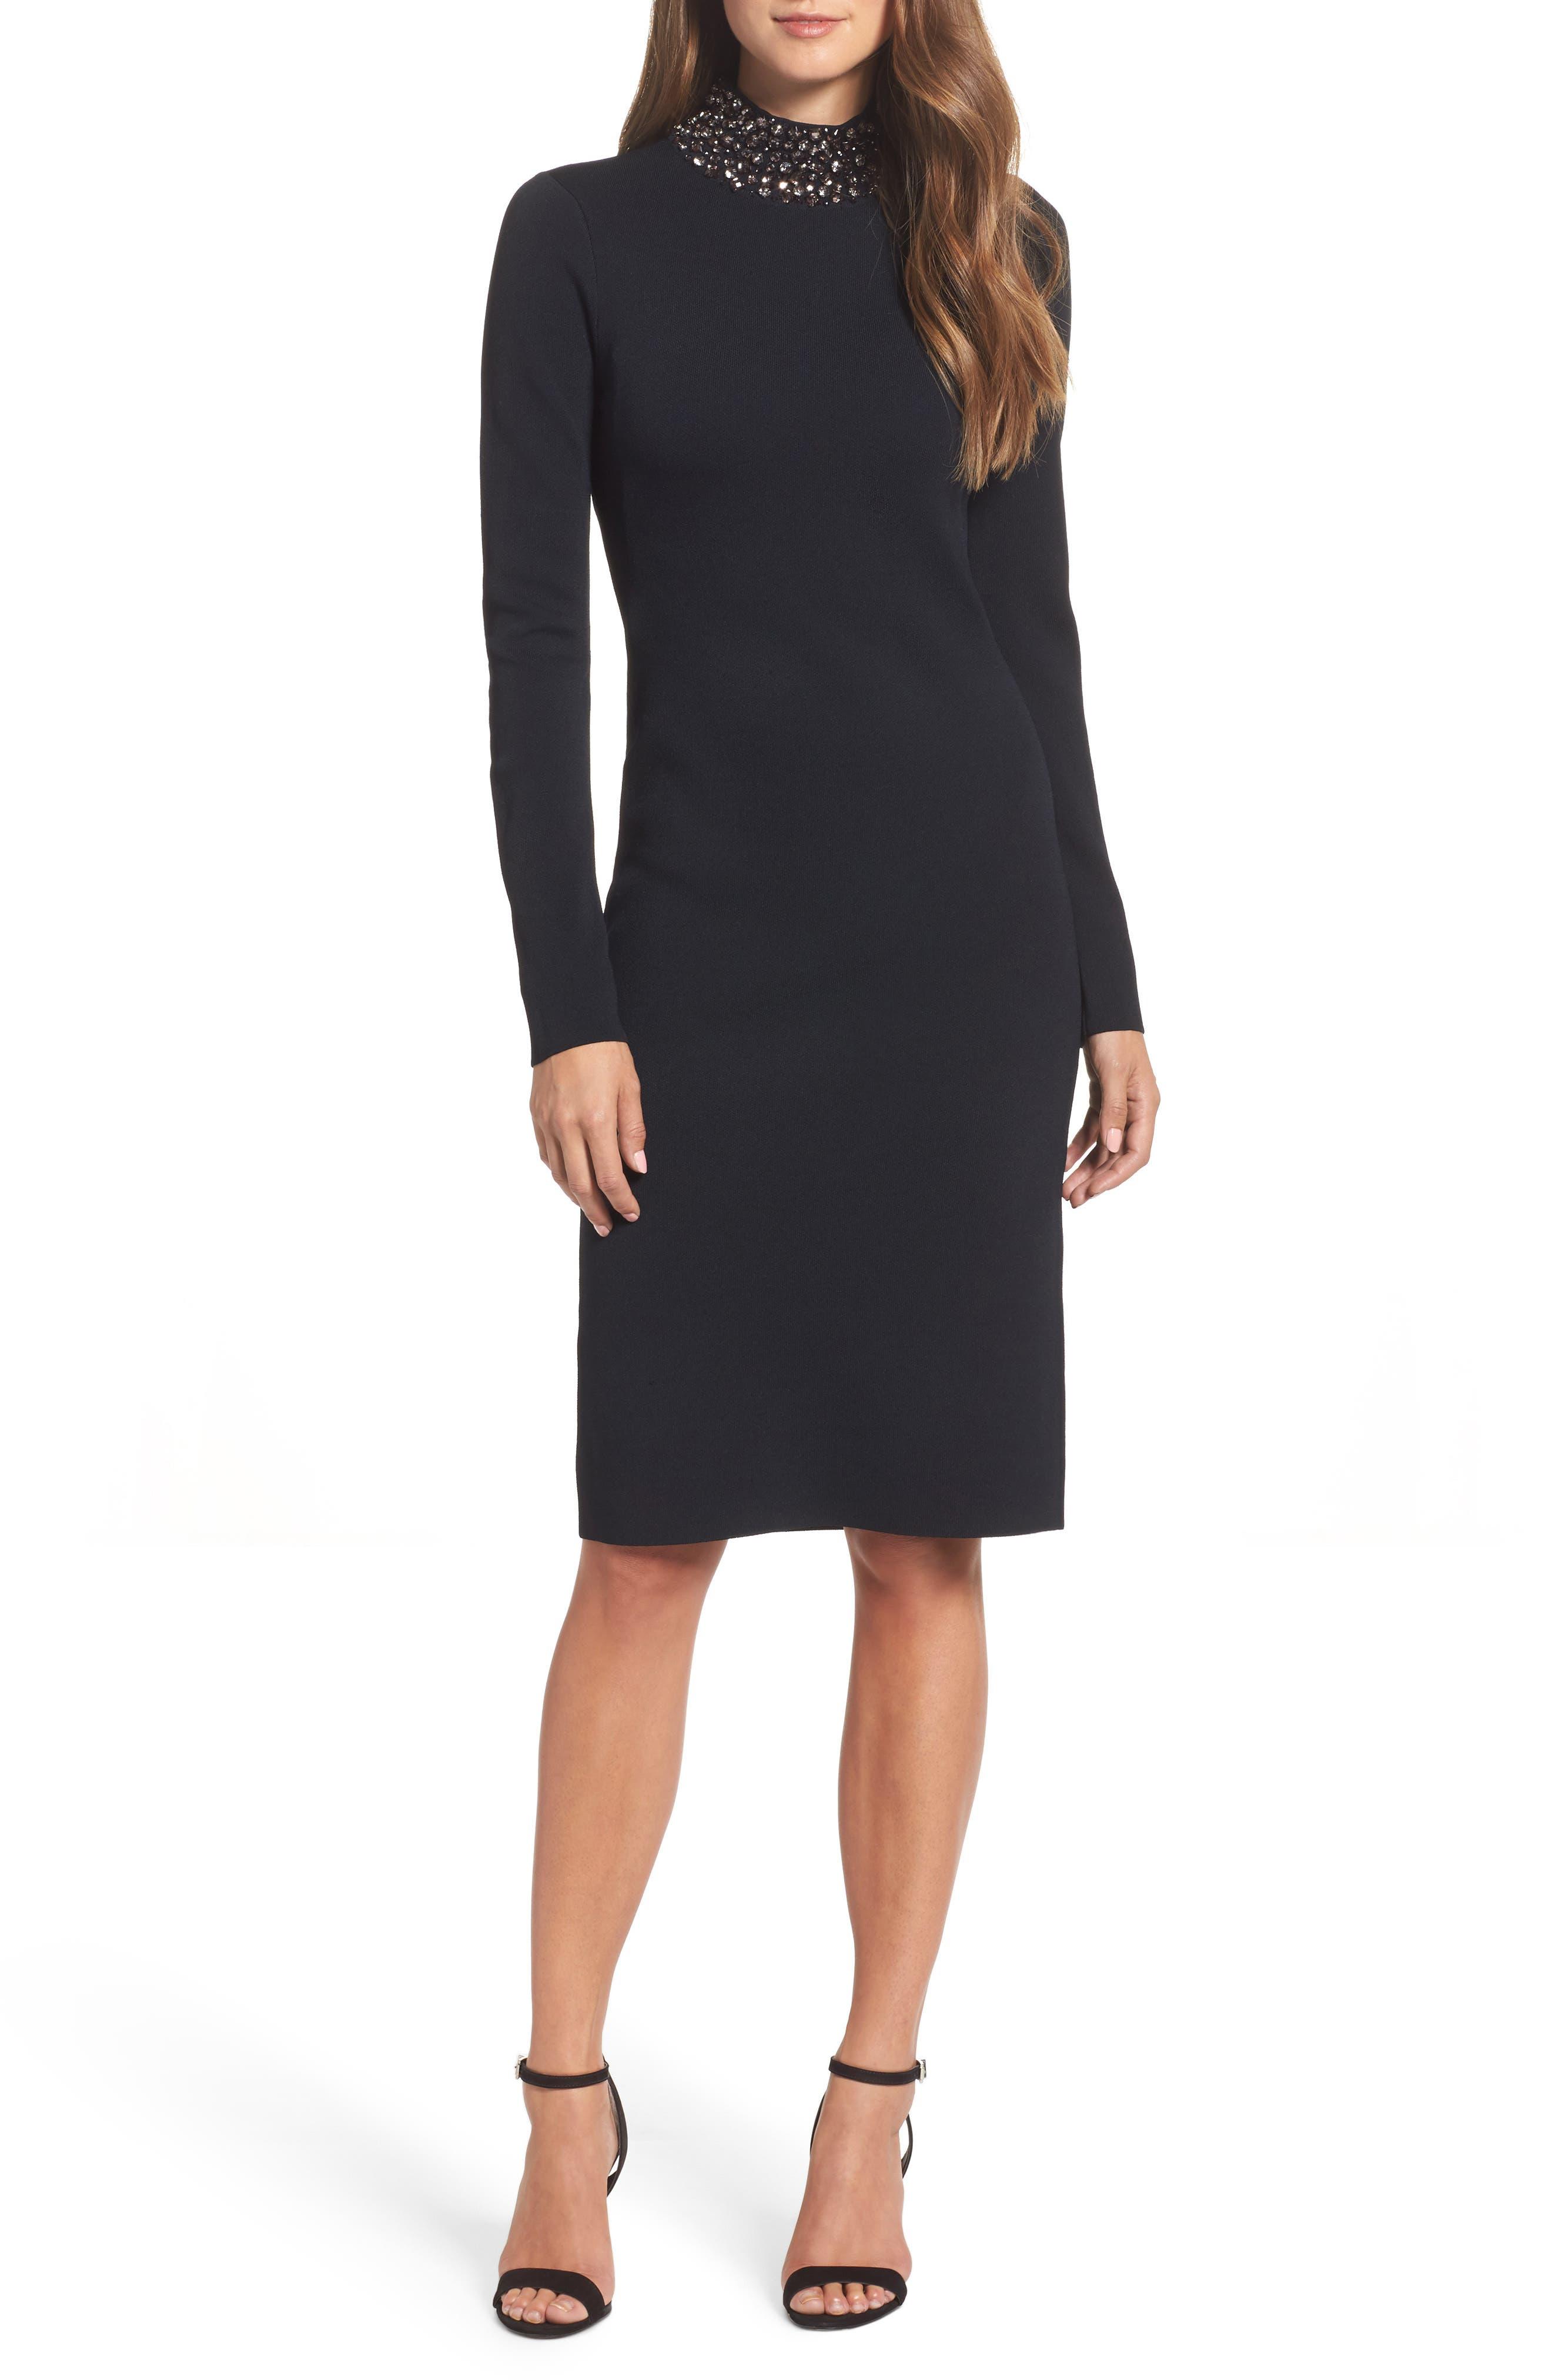 Alternate Image 1 Selected - Eliza J Jeweled Sheath Dress